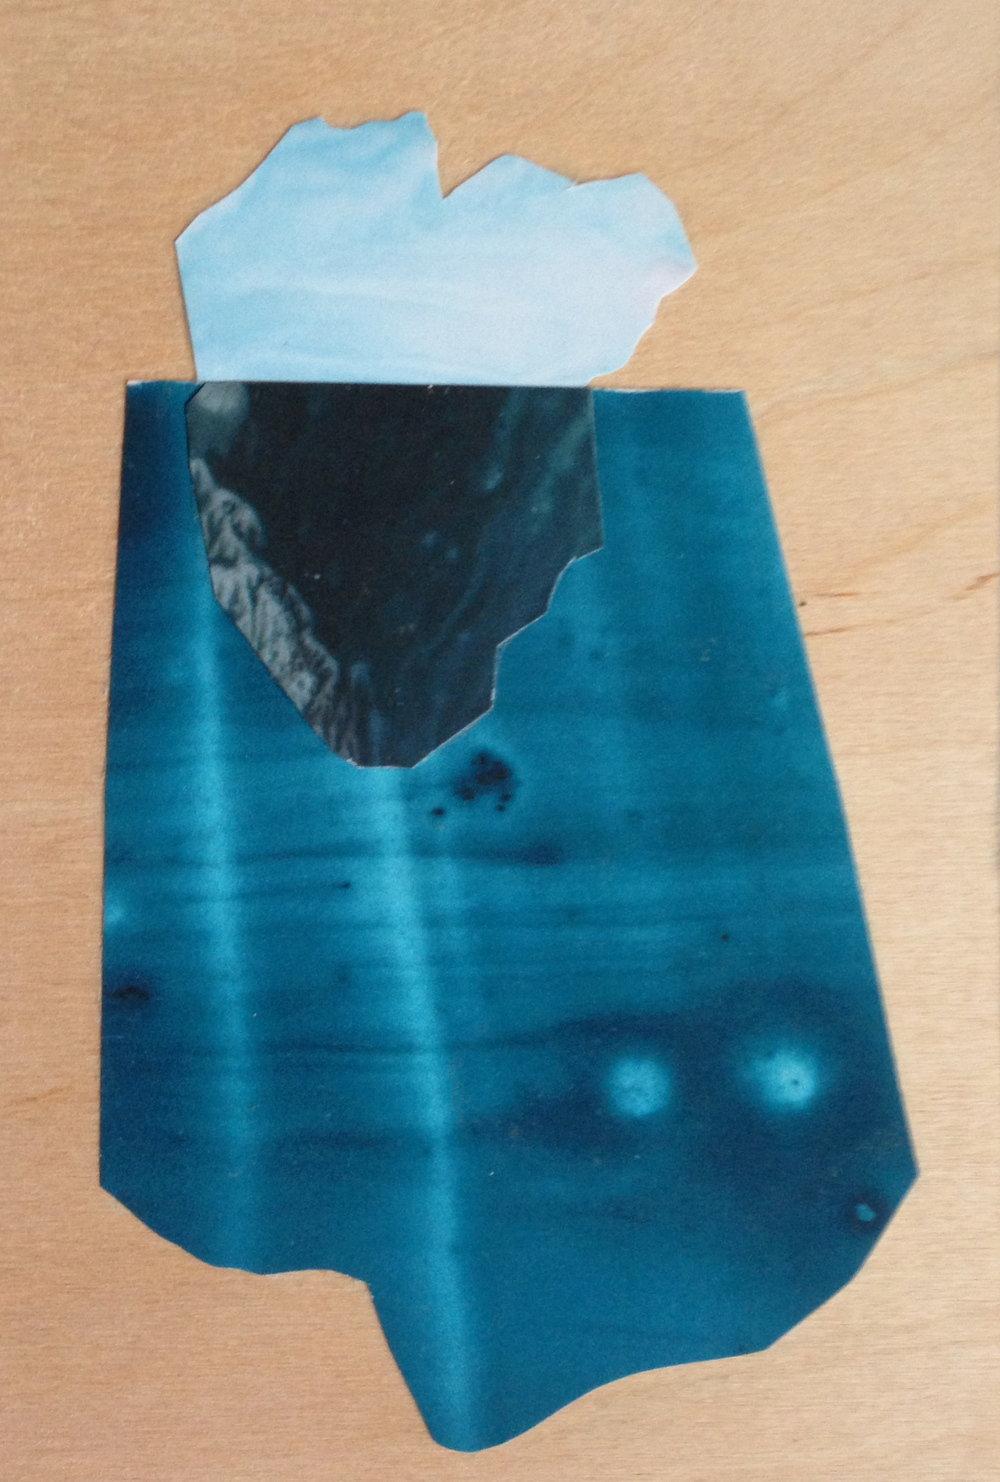 Iceberg, Collage. Sarah Winkler.